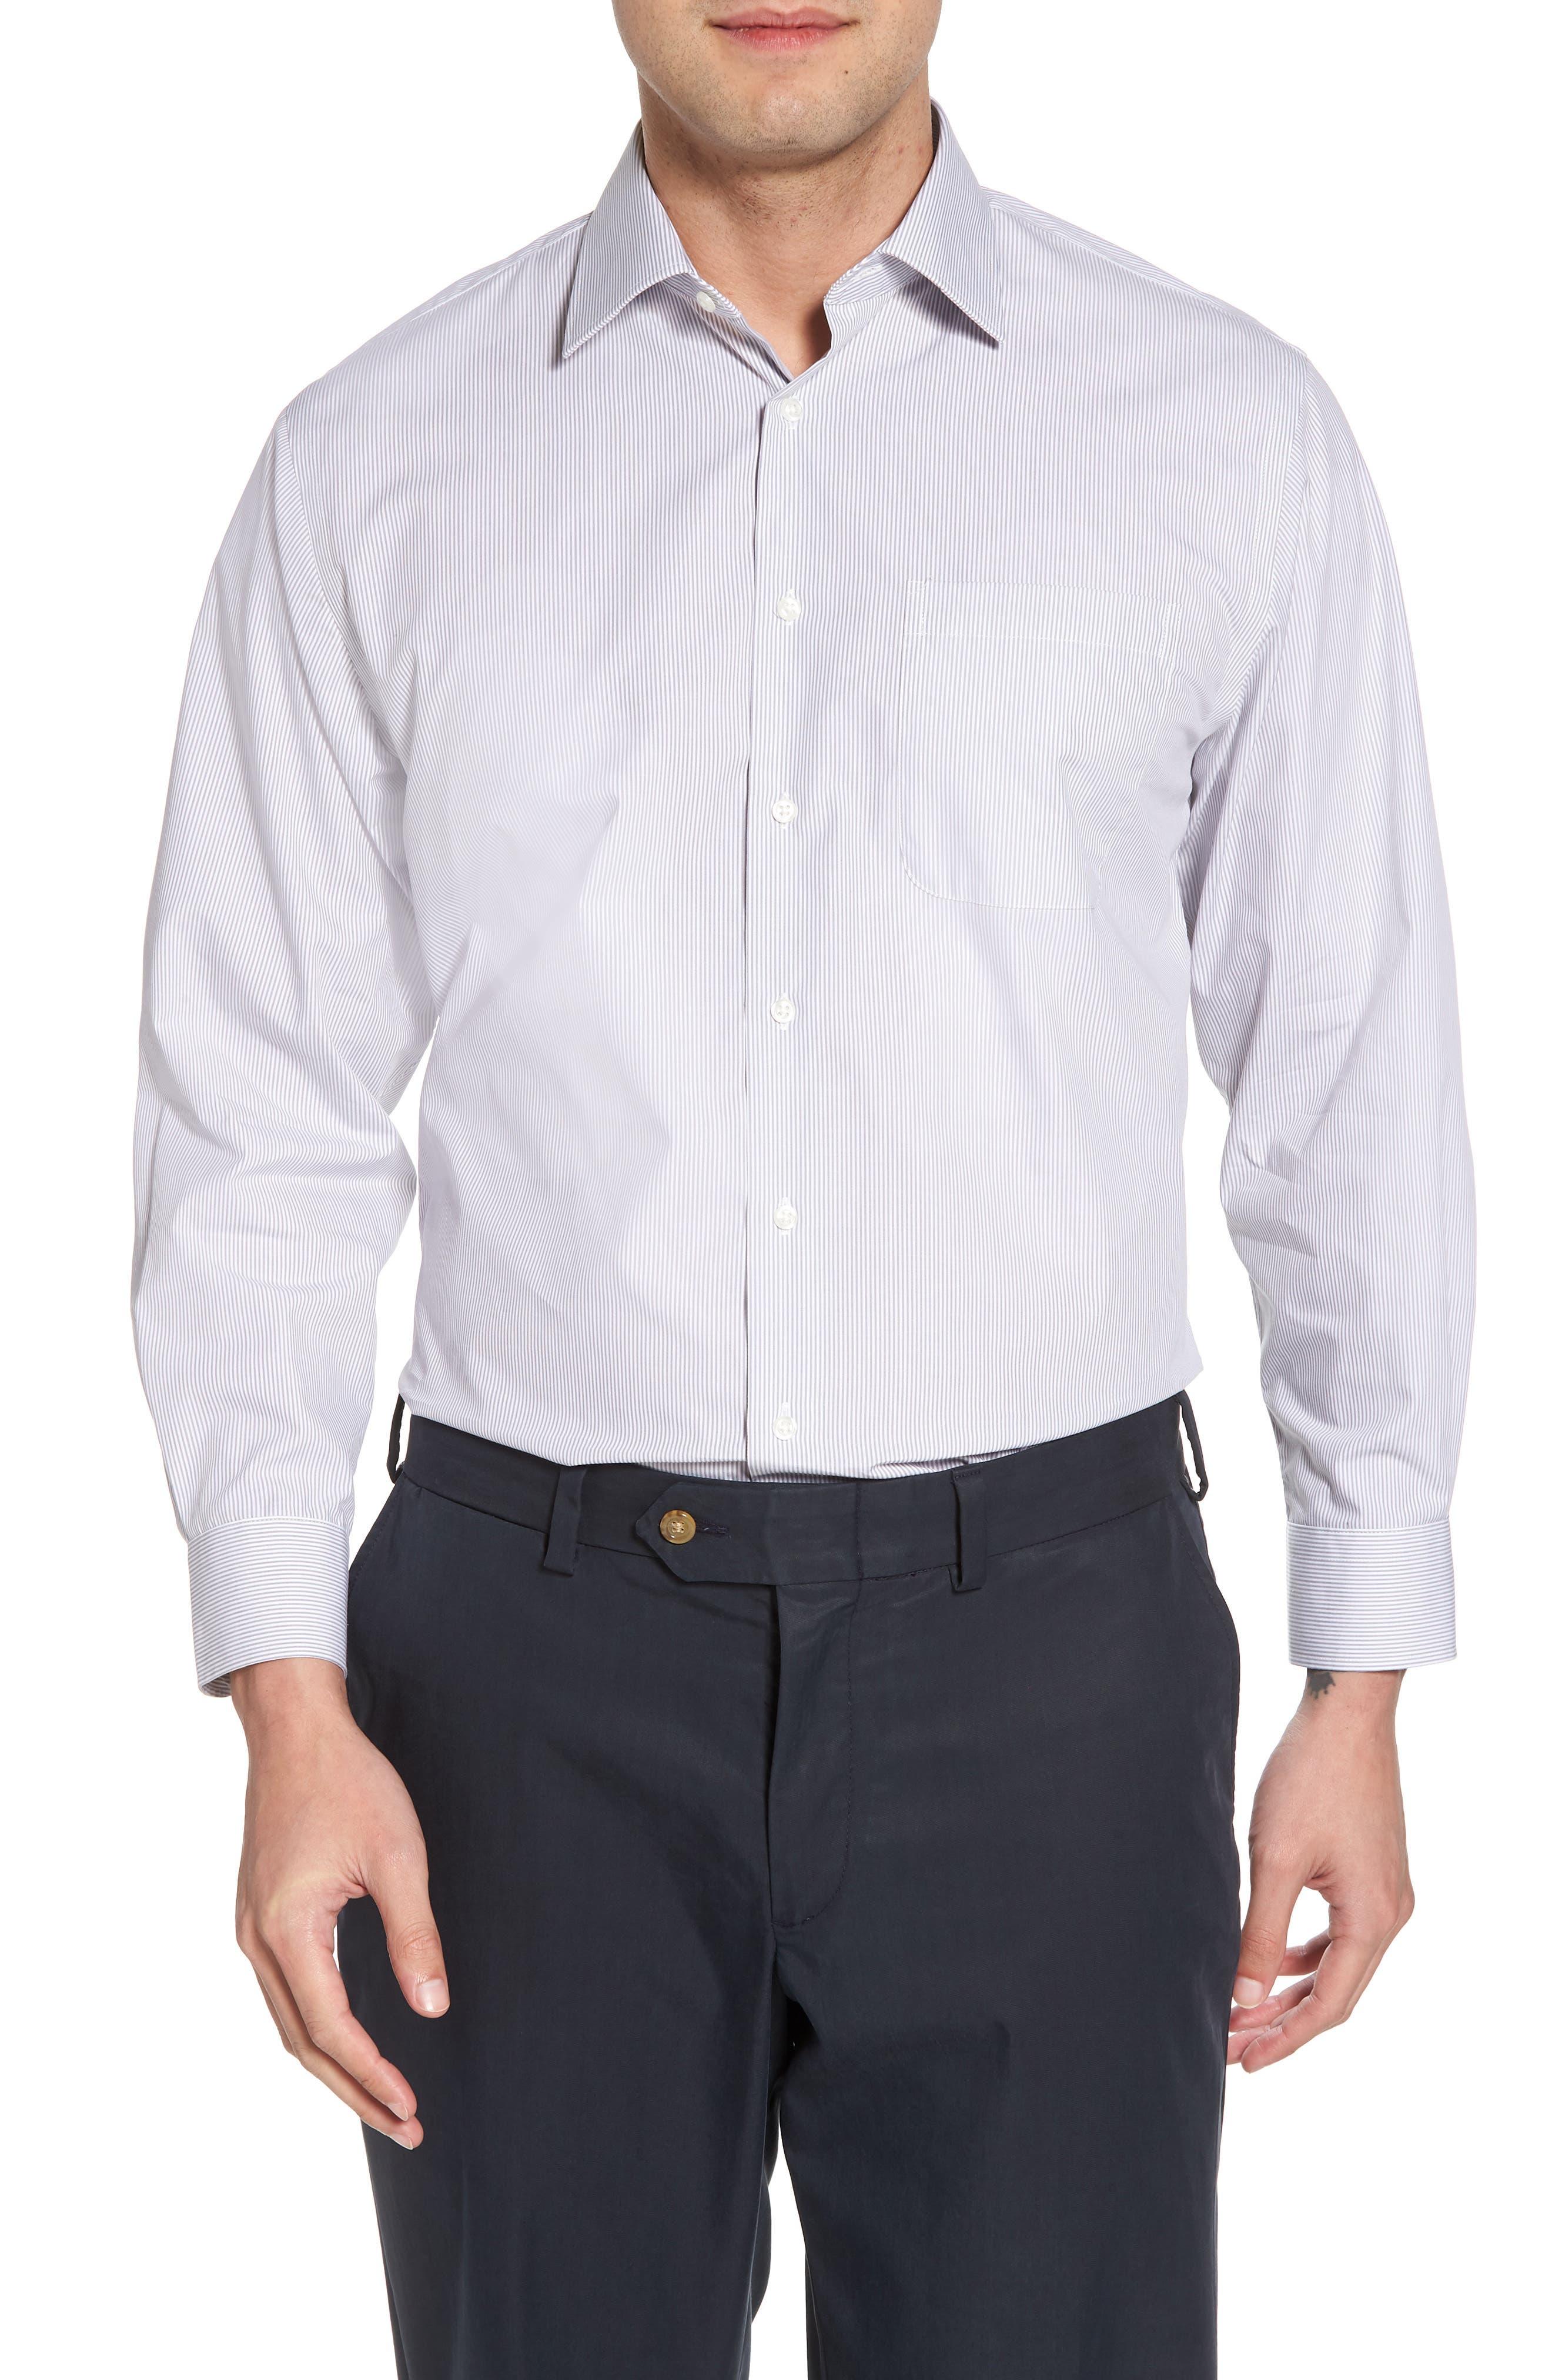 Nordstrom Men's Shop Smartcare™ Traditional Fit Stripe Dress Shirt